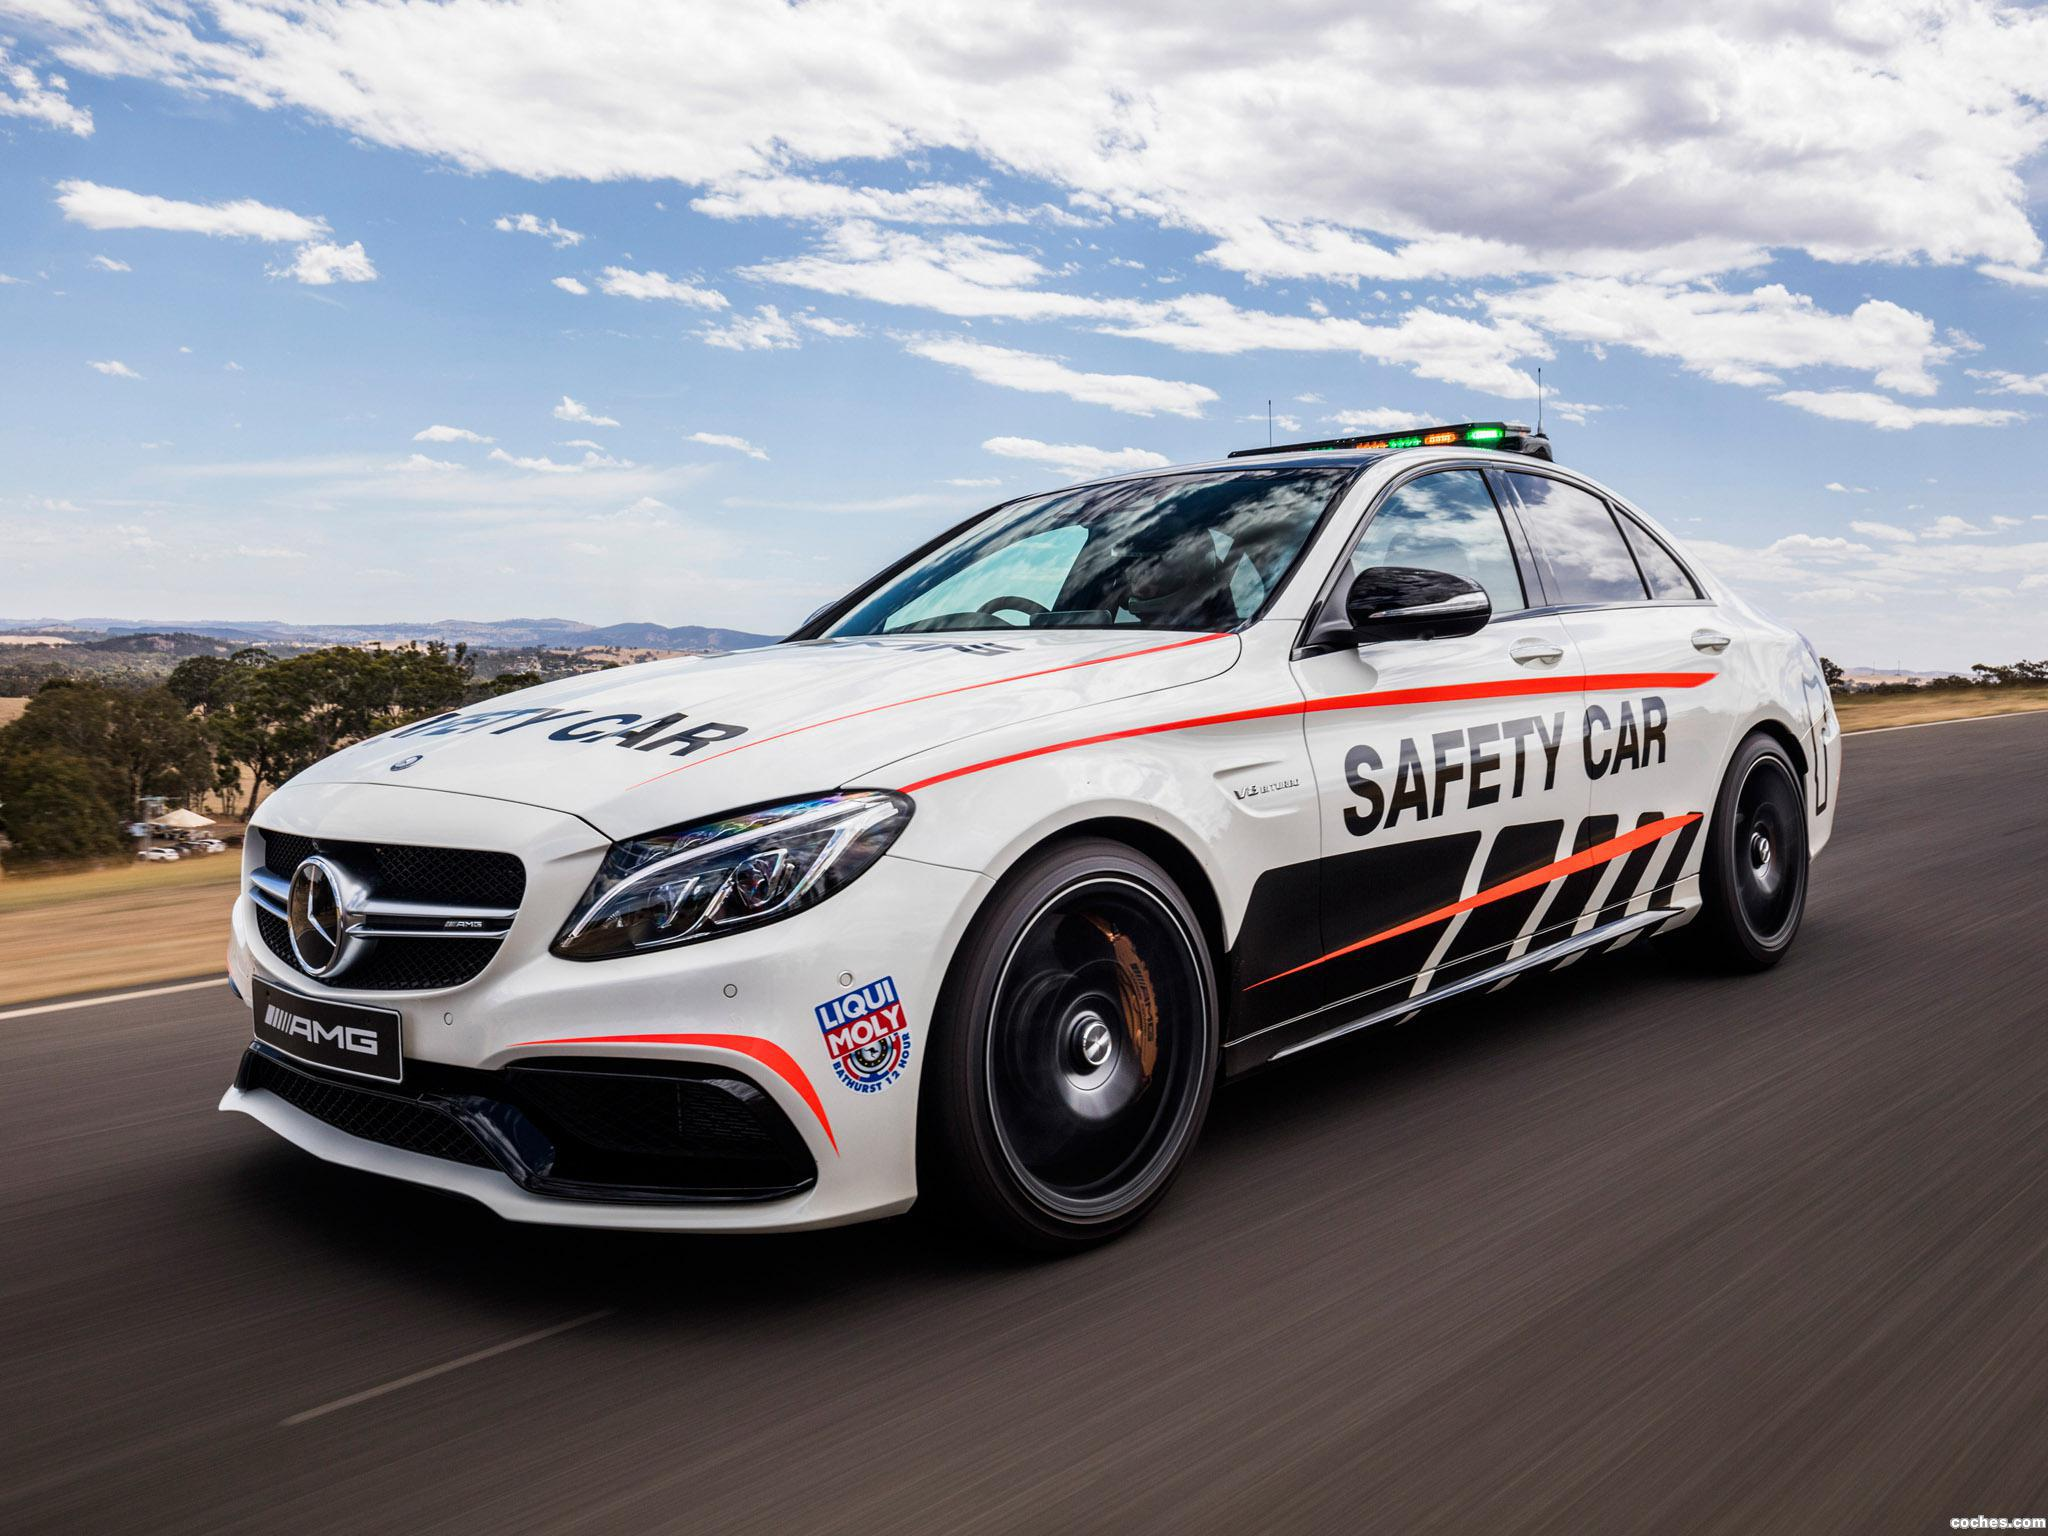 Foto 3 de Mercedes AMG C63 S Safety Car W205 2016